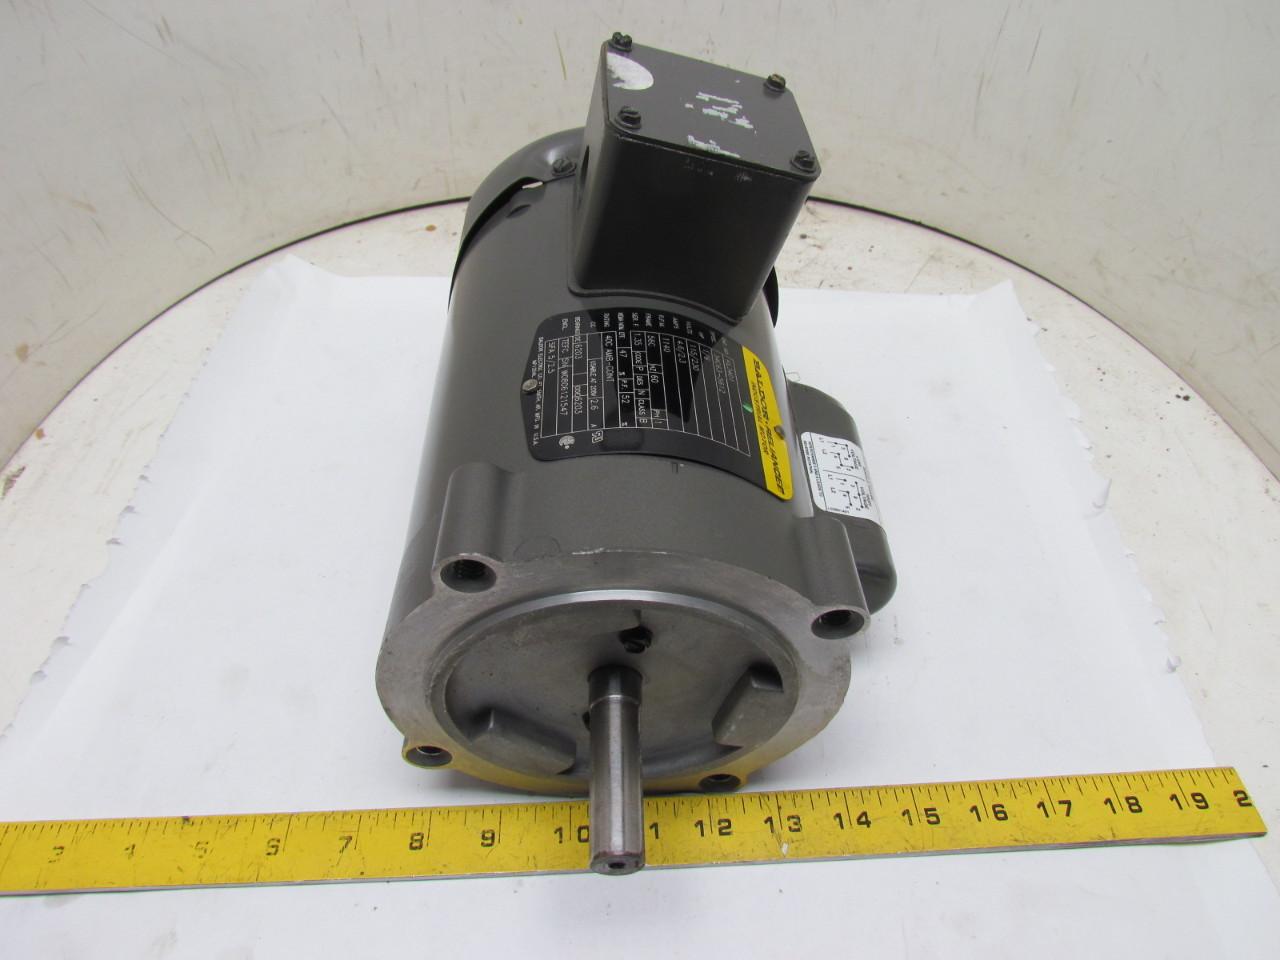 Baldor reliance kl3401 single phase electric motor 1 6hp for Baldor 2 hp single phase motor